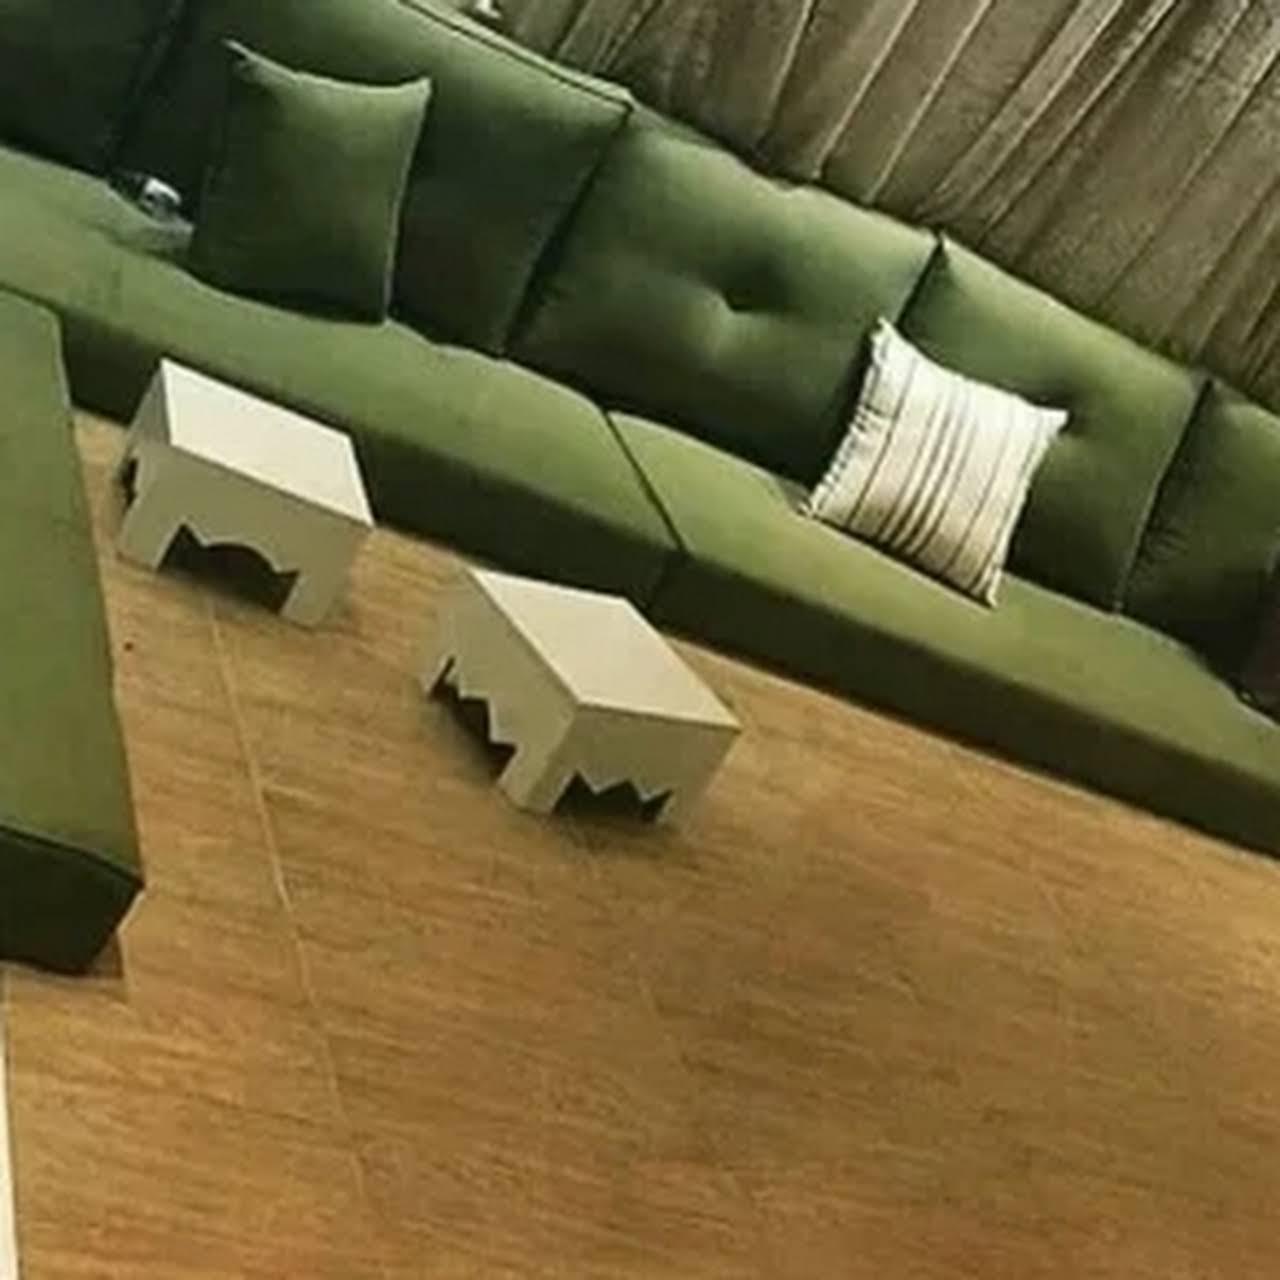 SOUQ AL HARAJ - Home Furniture Shop in الدوحة